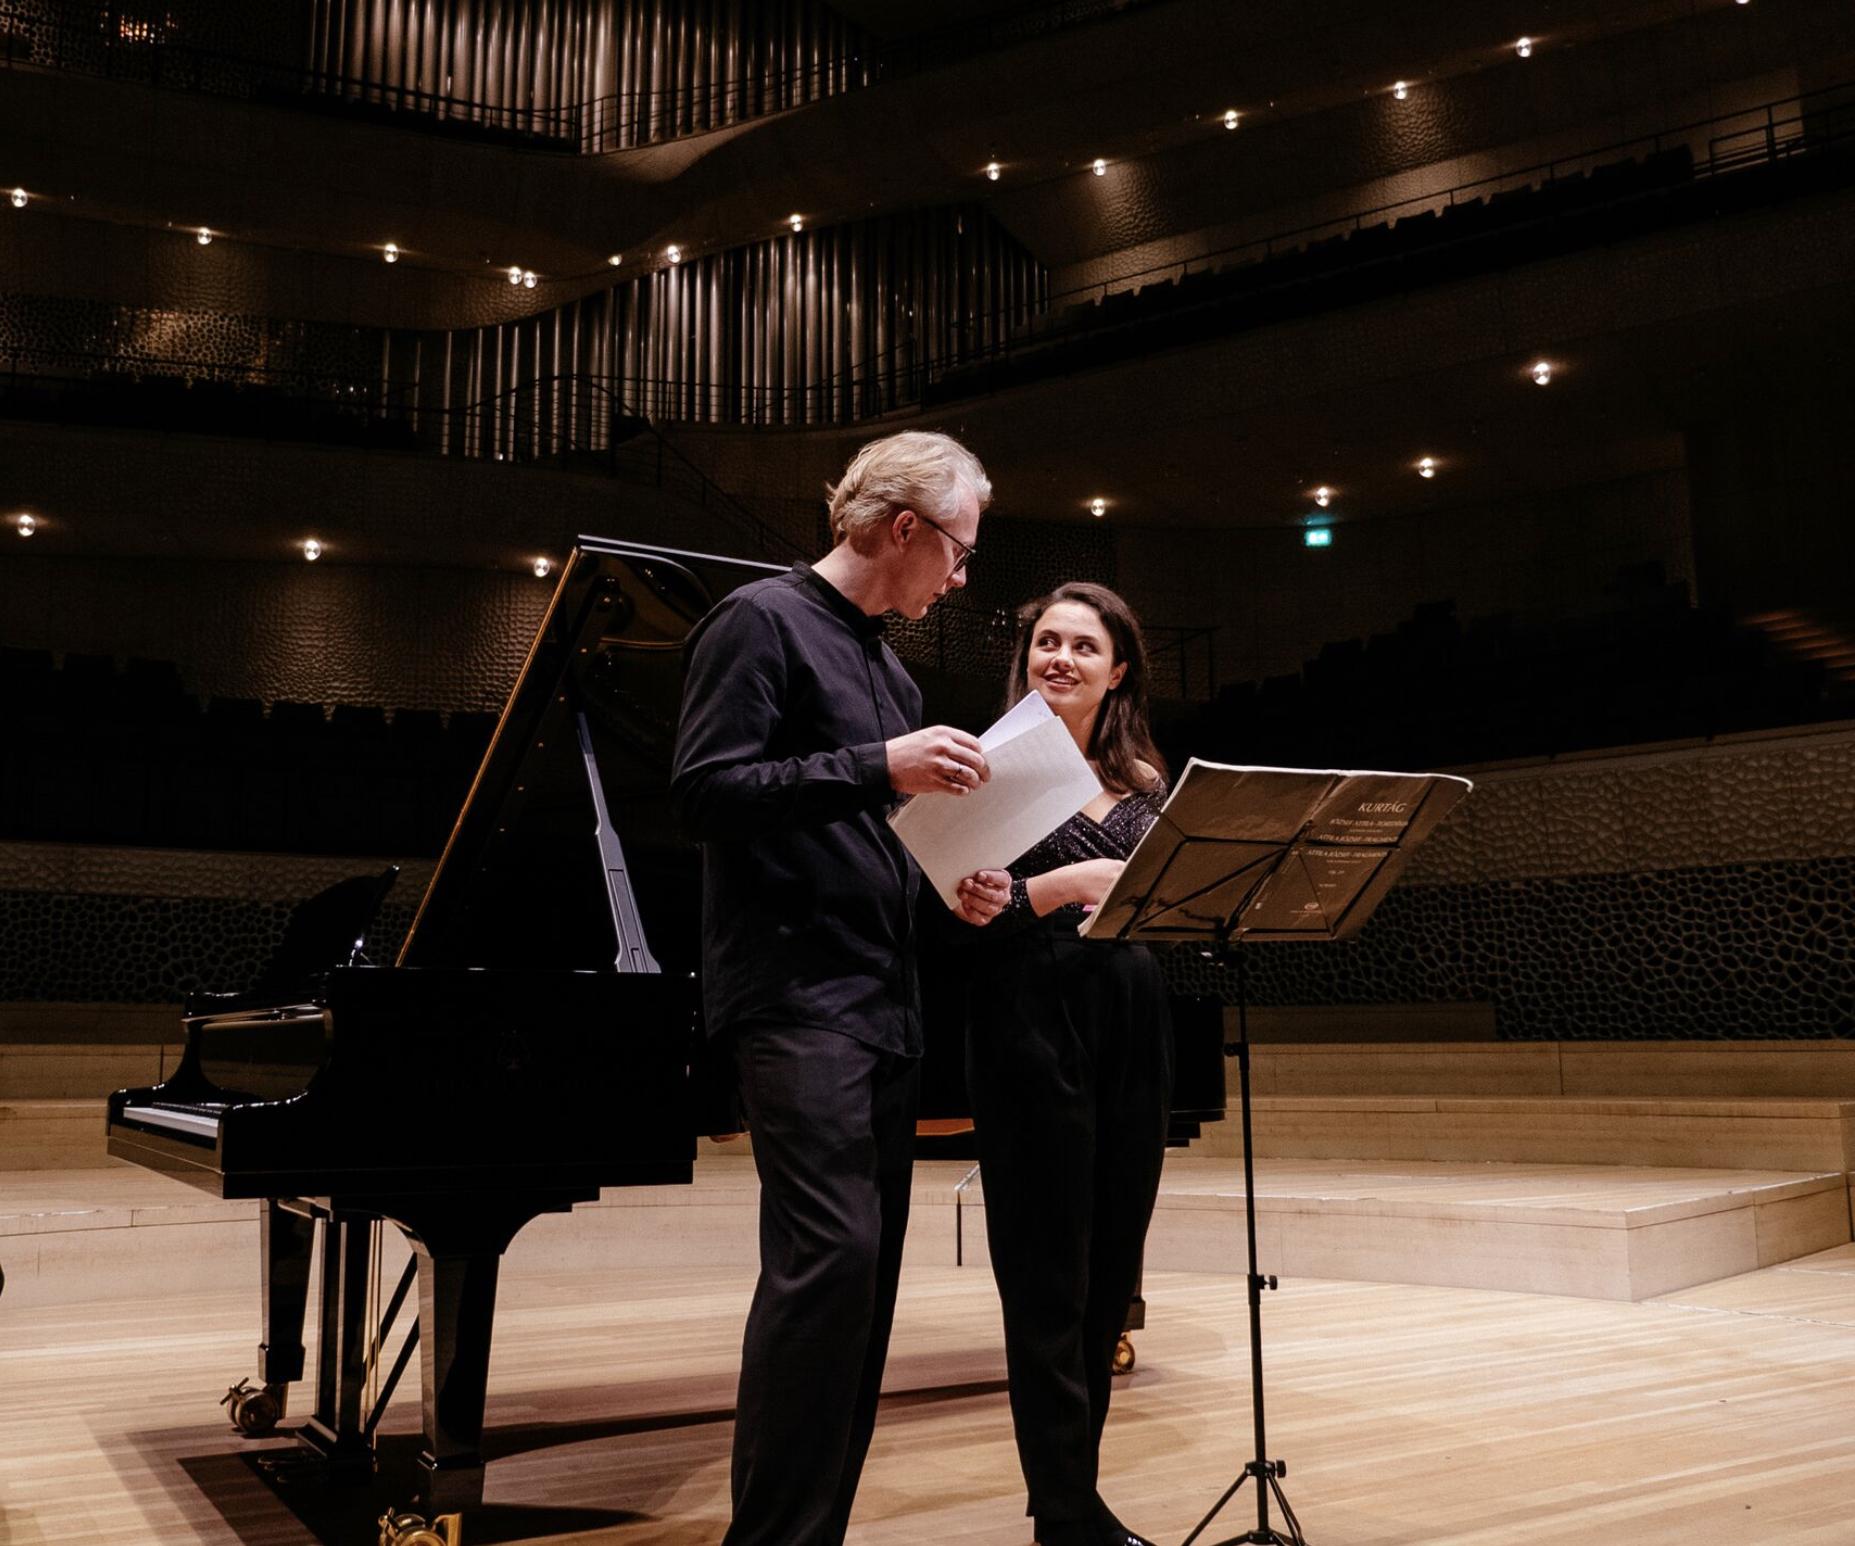 Fledermaus an der Elbphilharmonie - Katharina Konradi